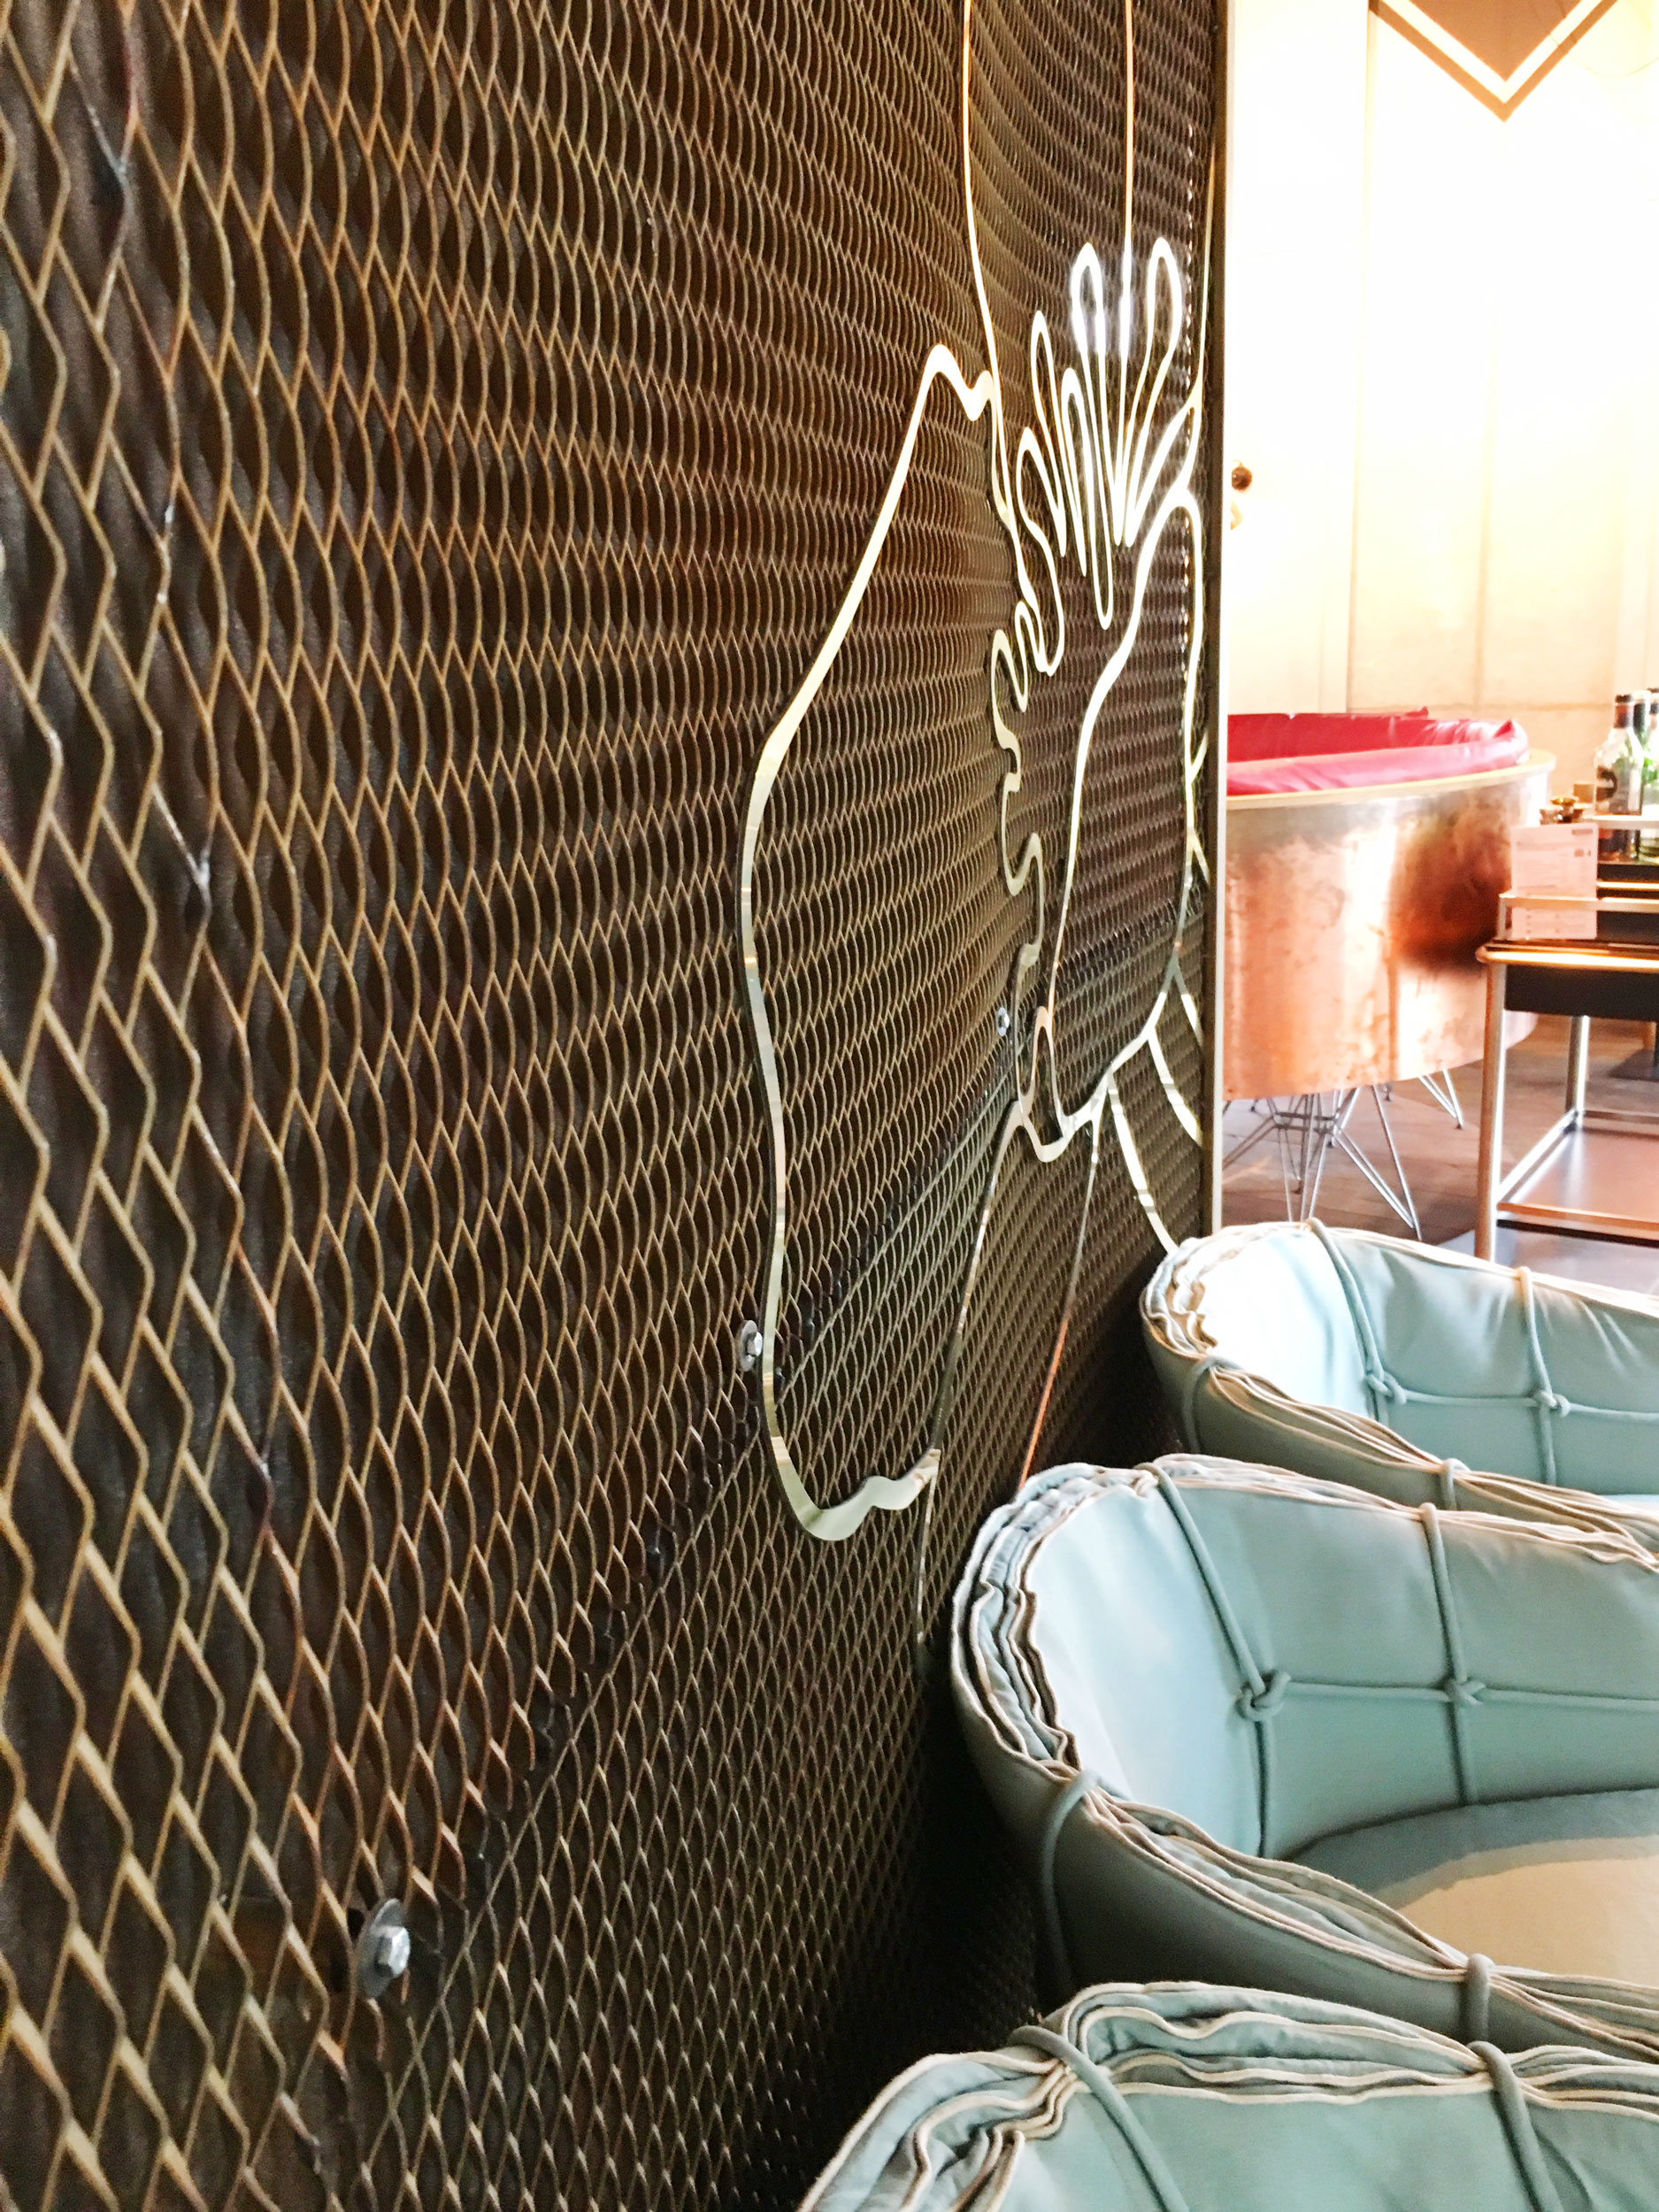 Perrier Jouet Branding La Boheme Muenchen Design Stil Manipulation 2017